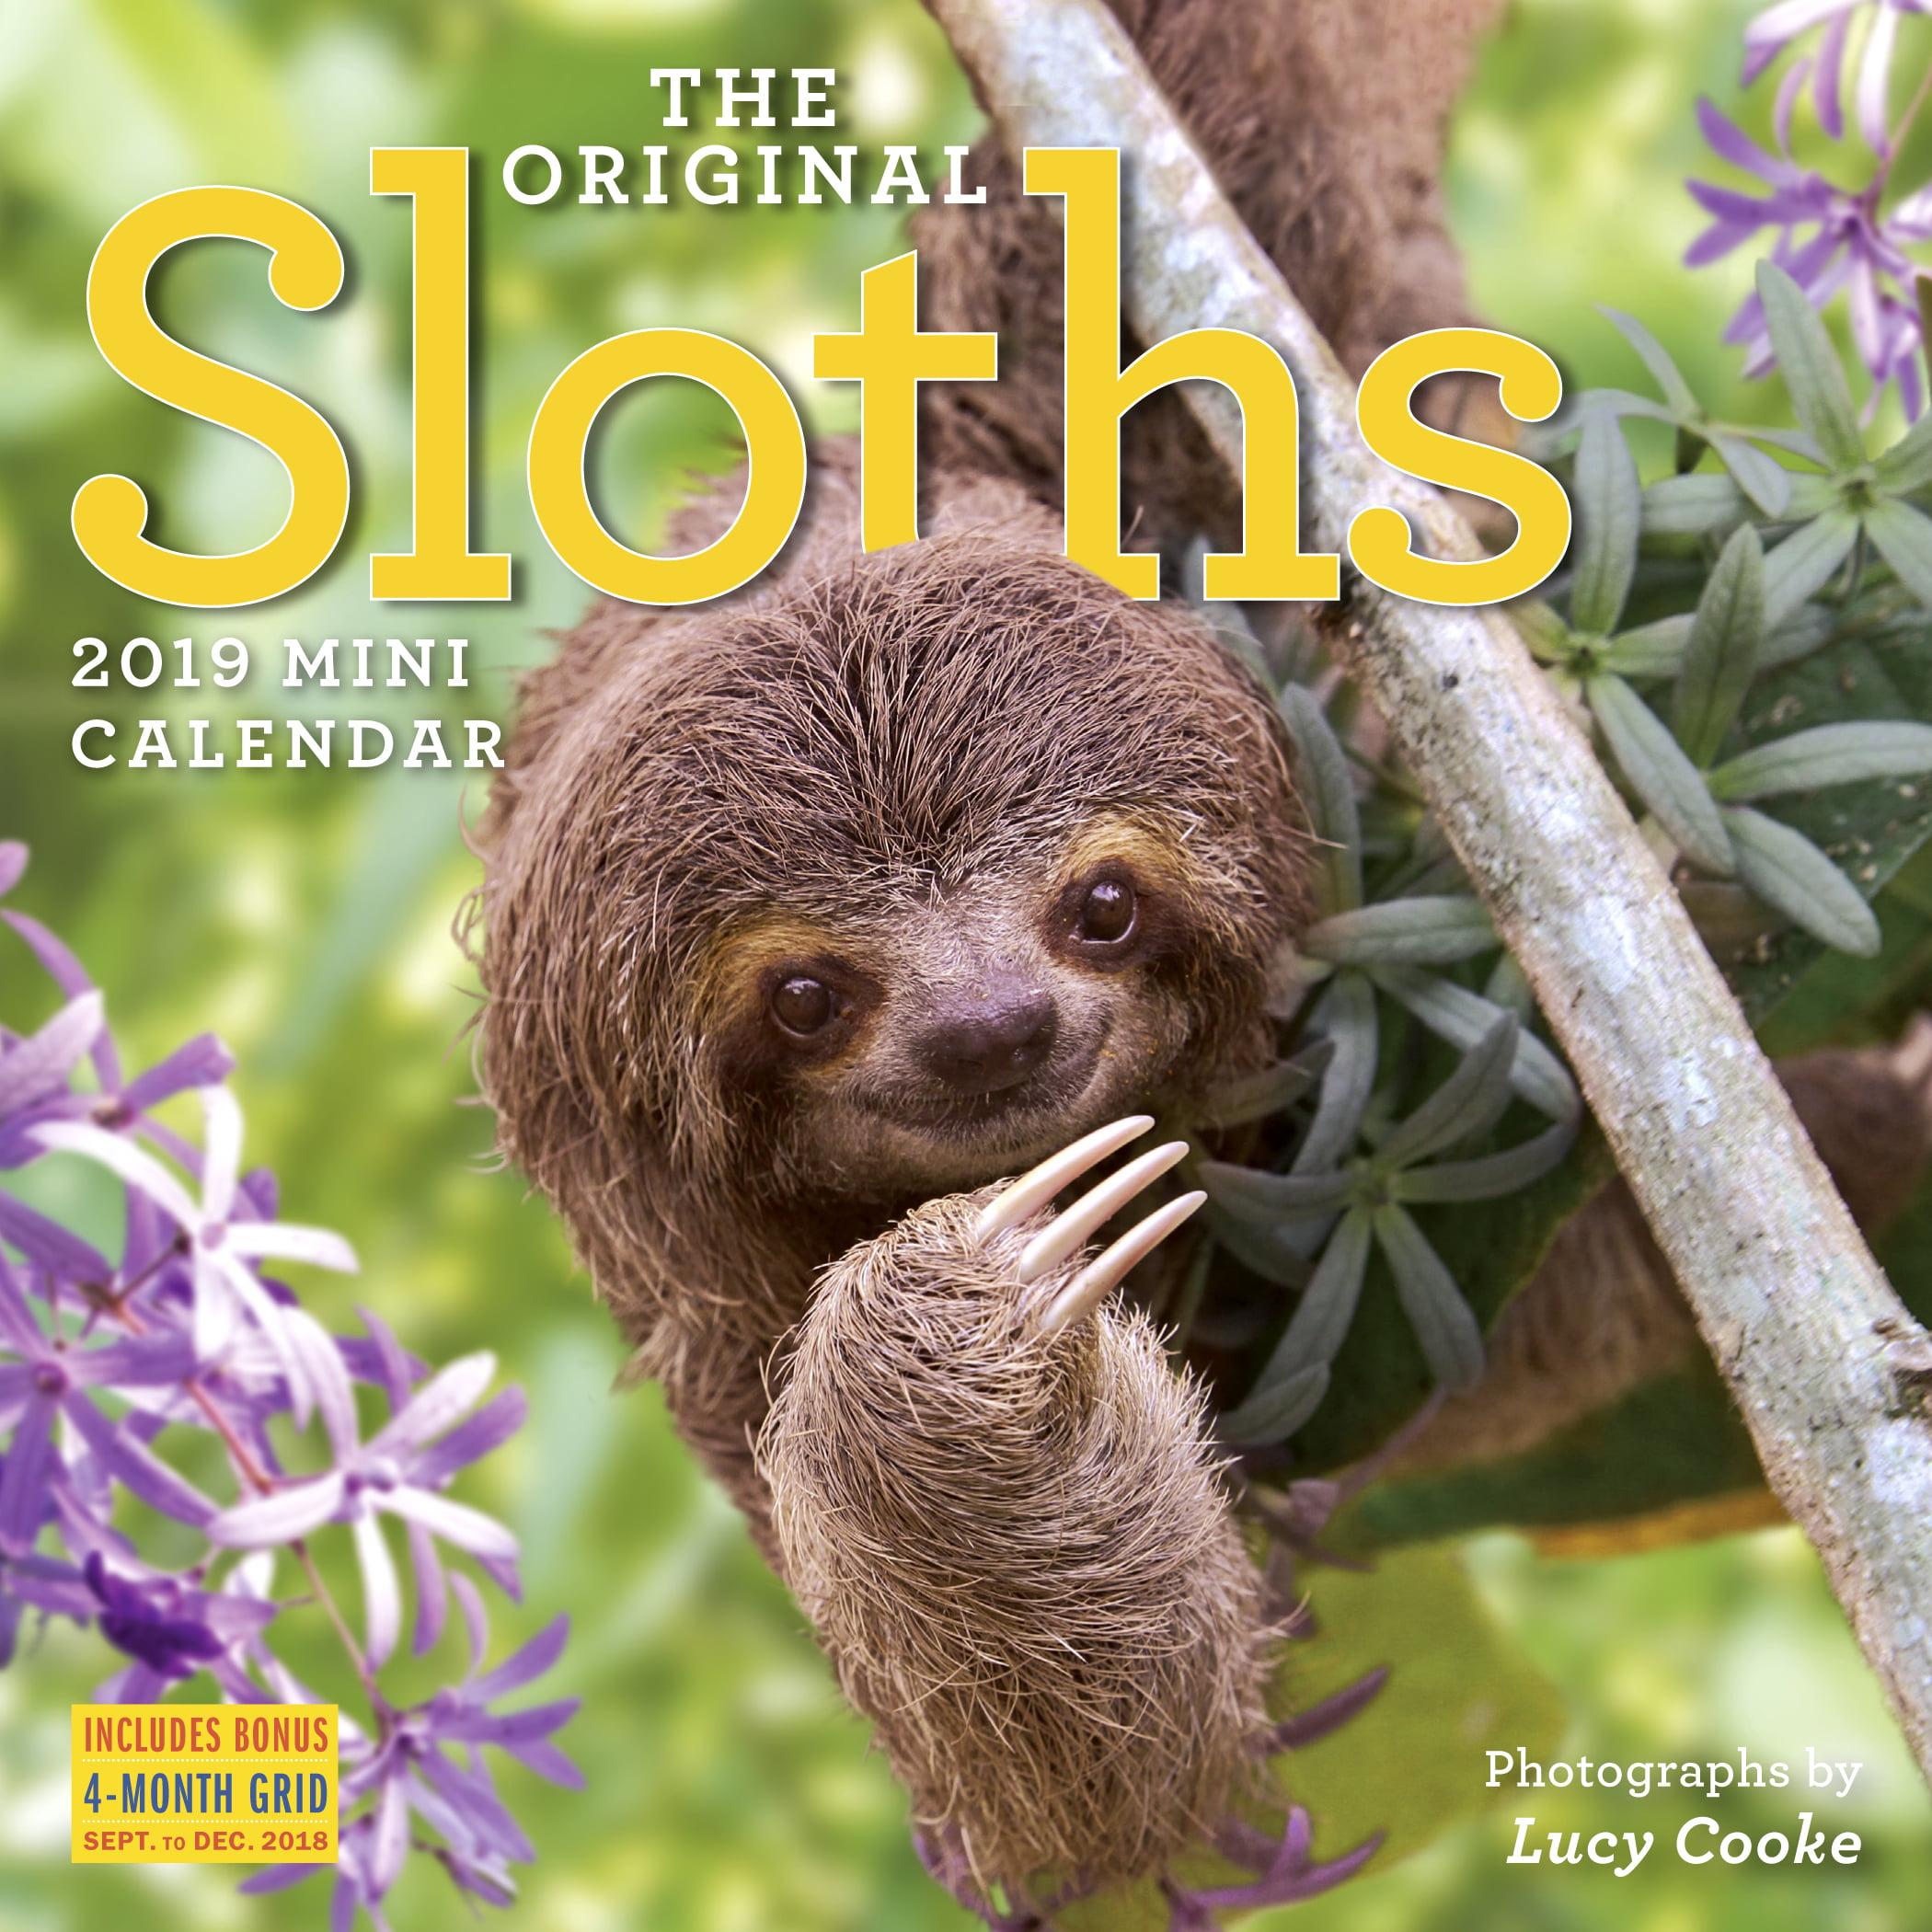 The Original Sloths Mini Wall Calendar 2019